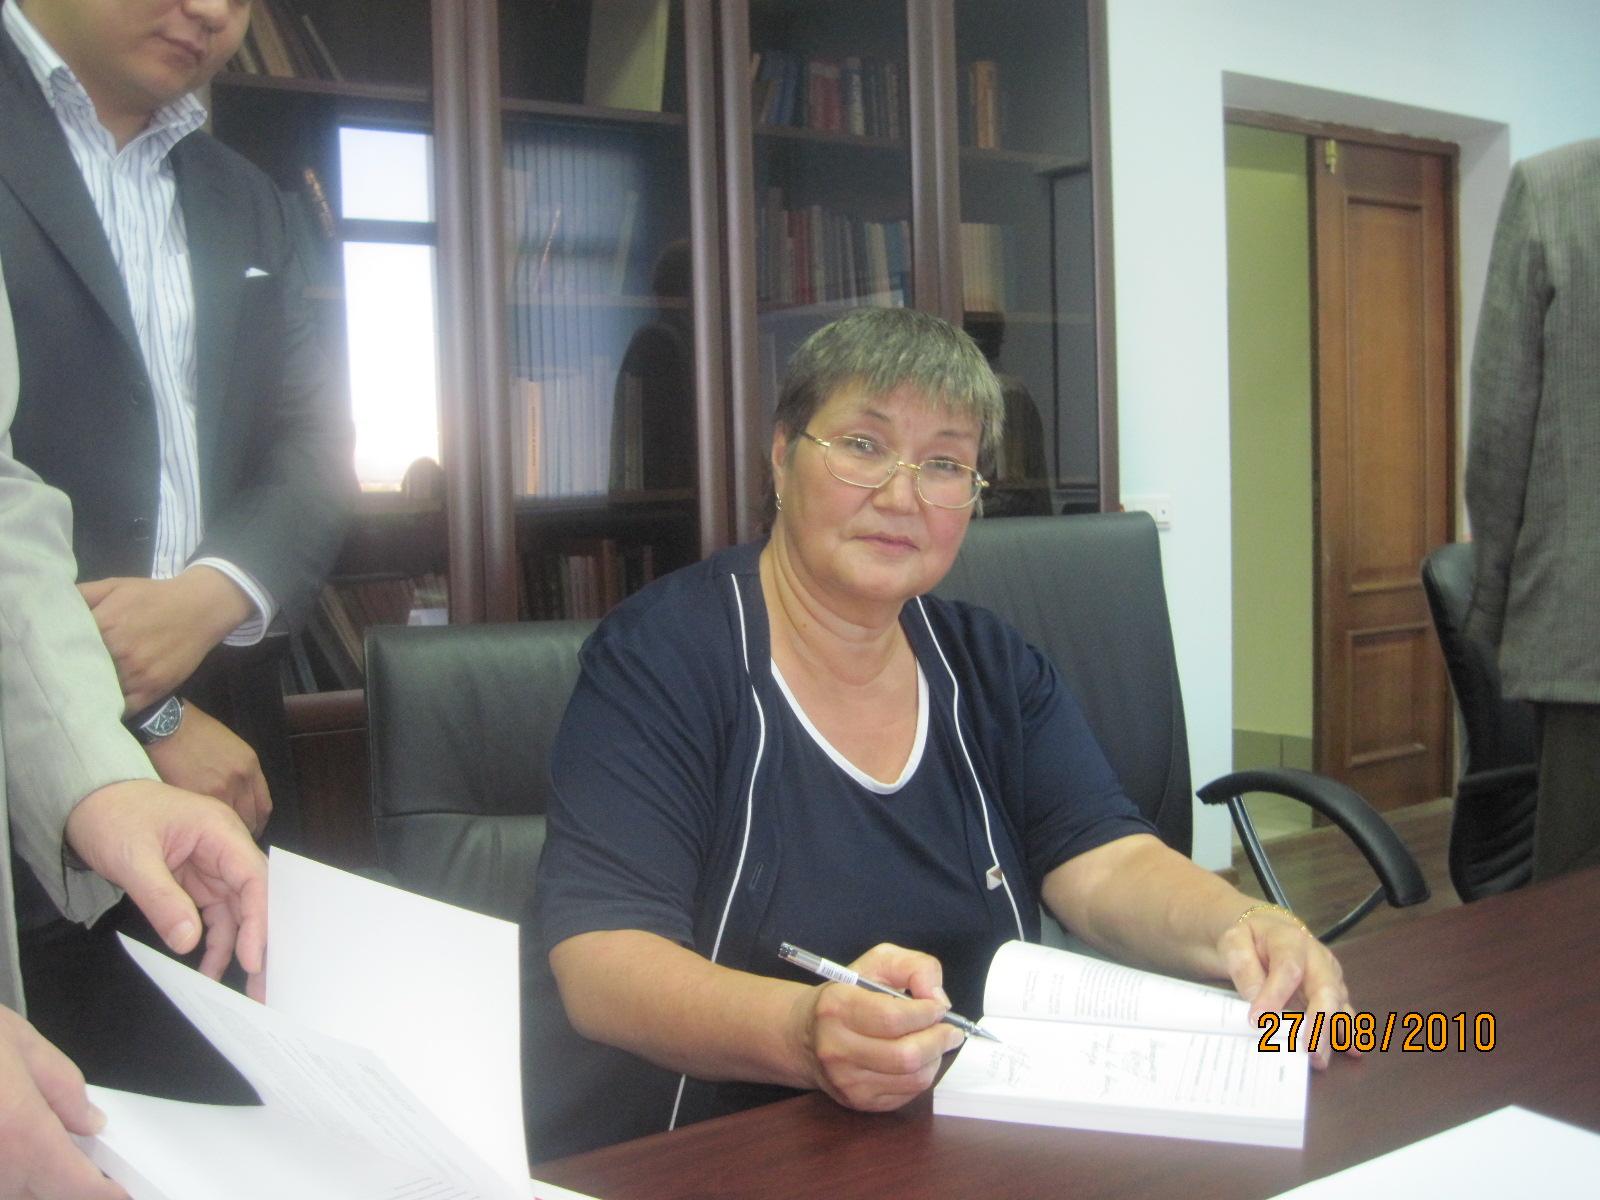 Akhmetova_Laila_2010_08_27_Stalin_KZ_leaders_26_Akhmetova_Laila_knigu_podpisyvaet